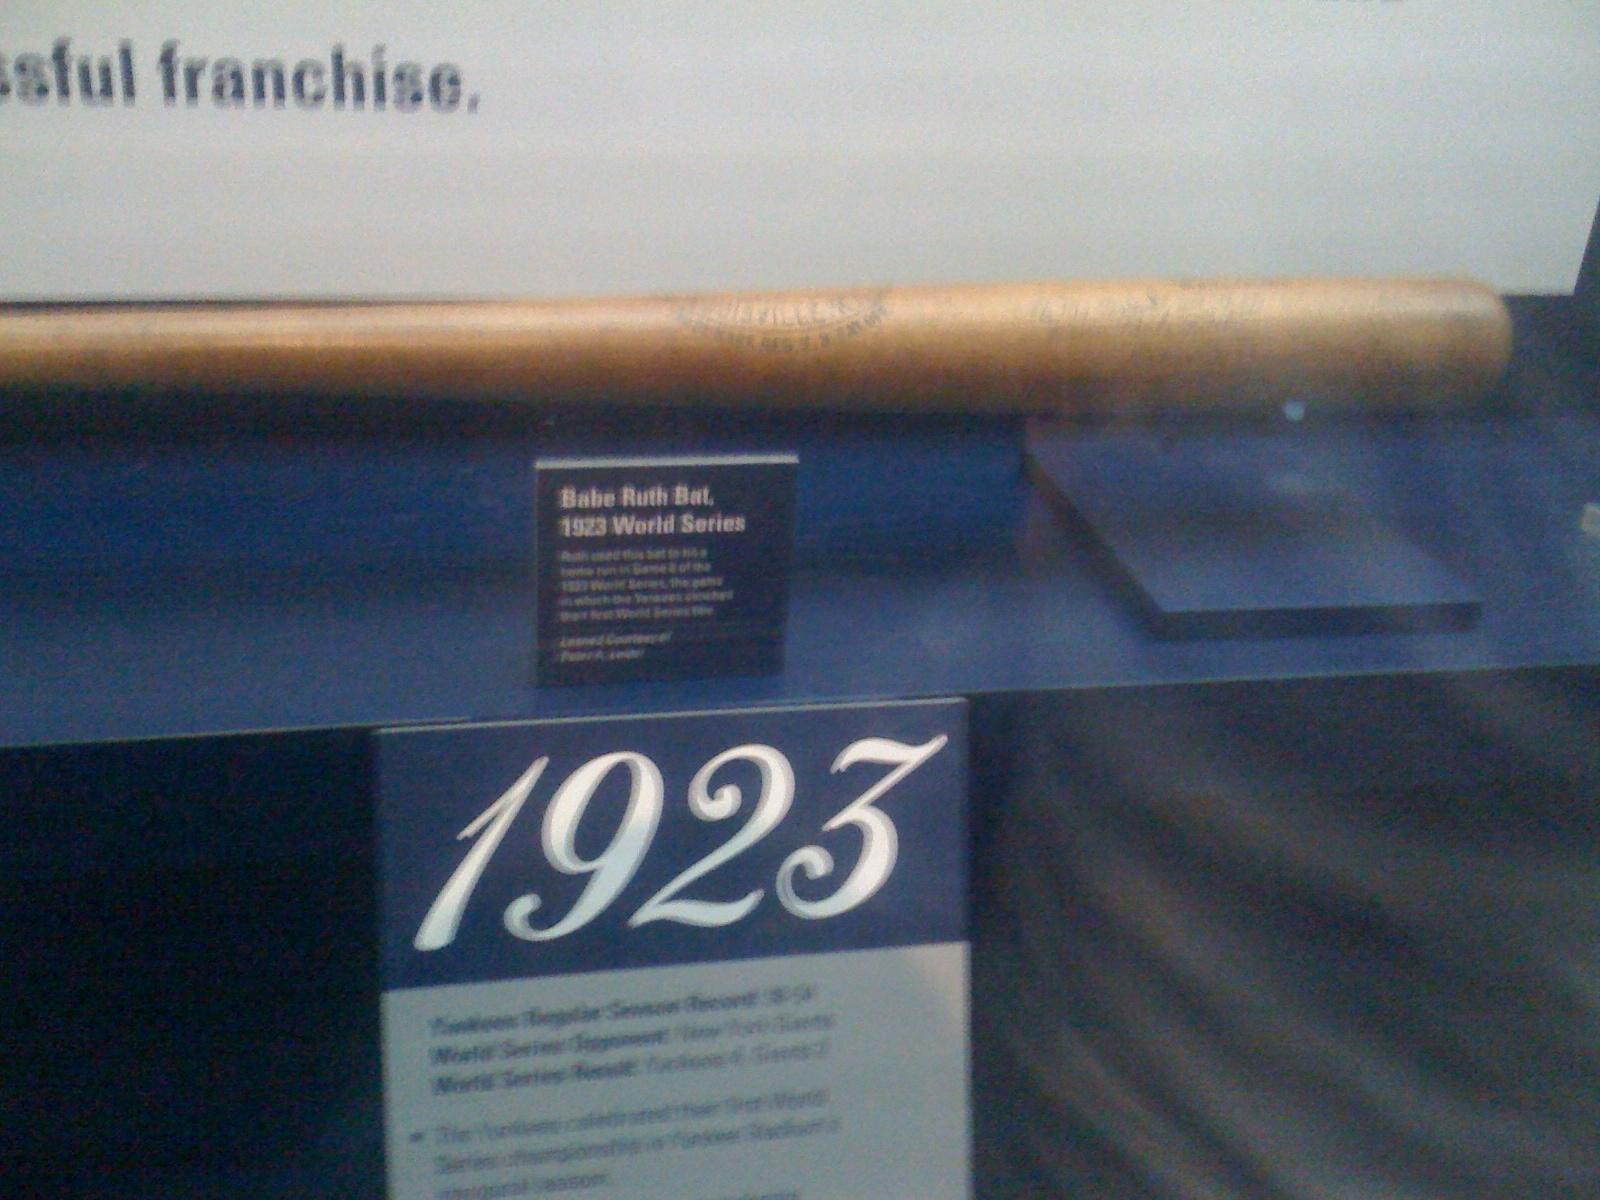 Babe Ruth's Bat